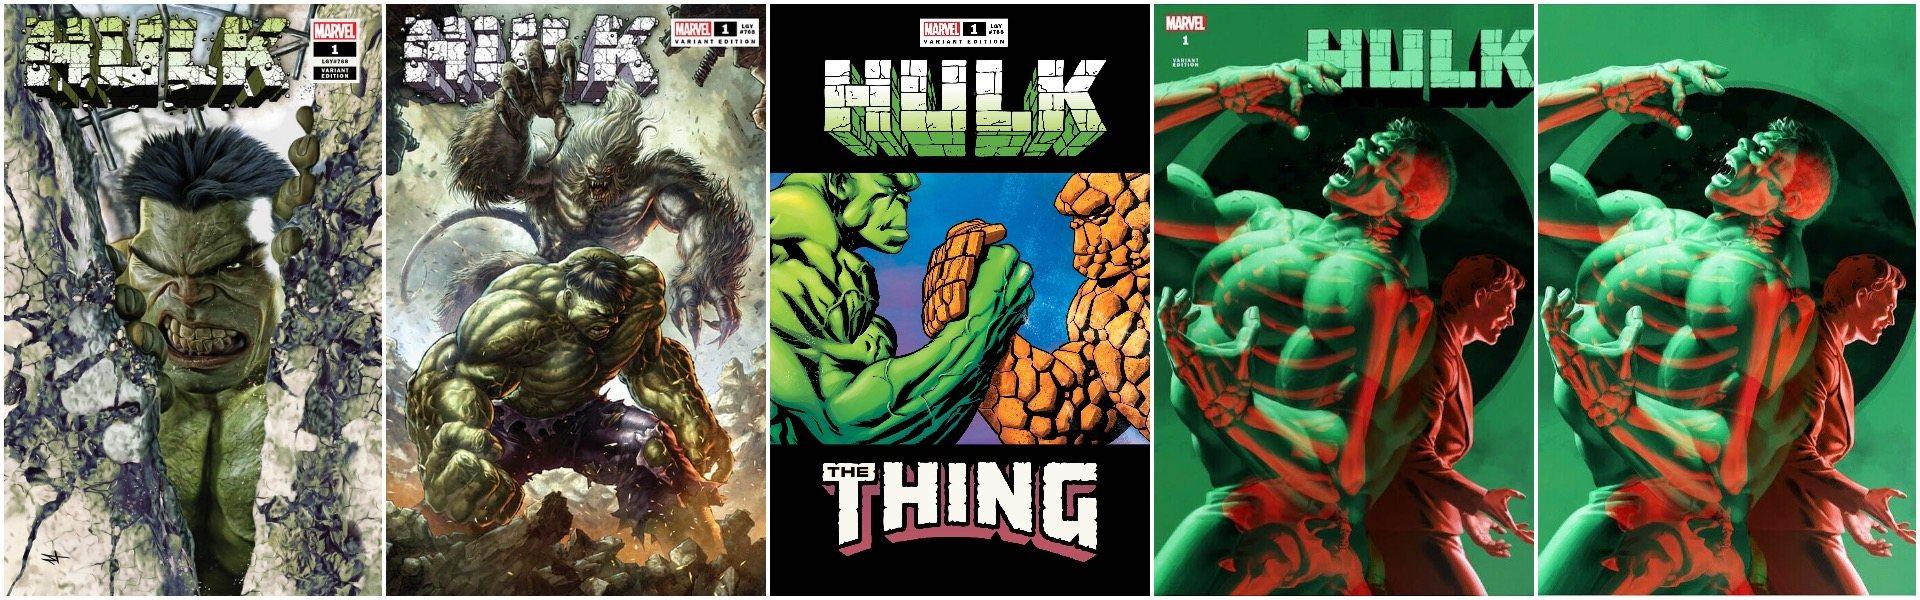 Hulk #1 Exclusives